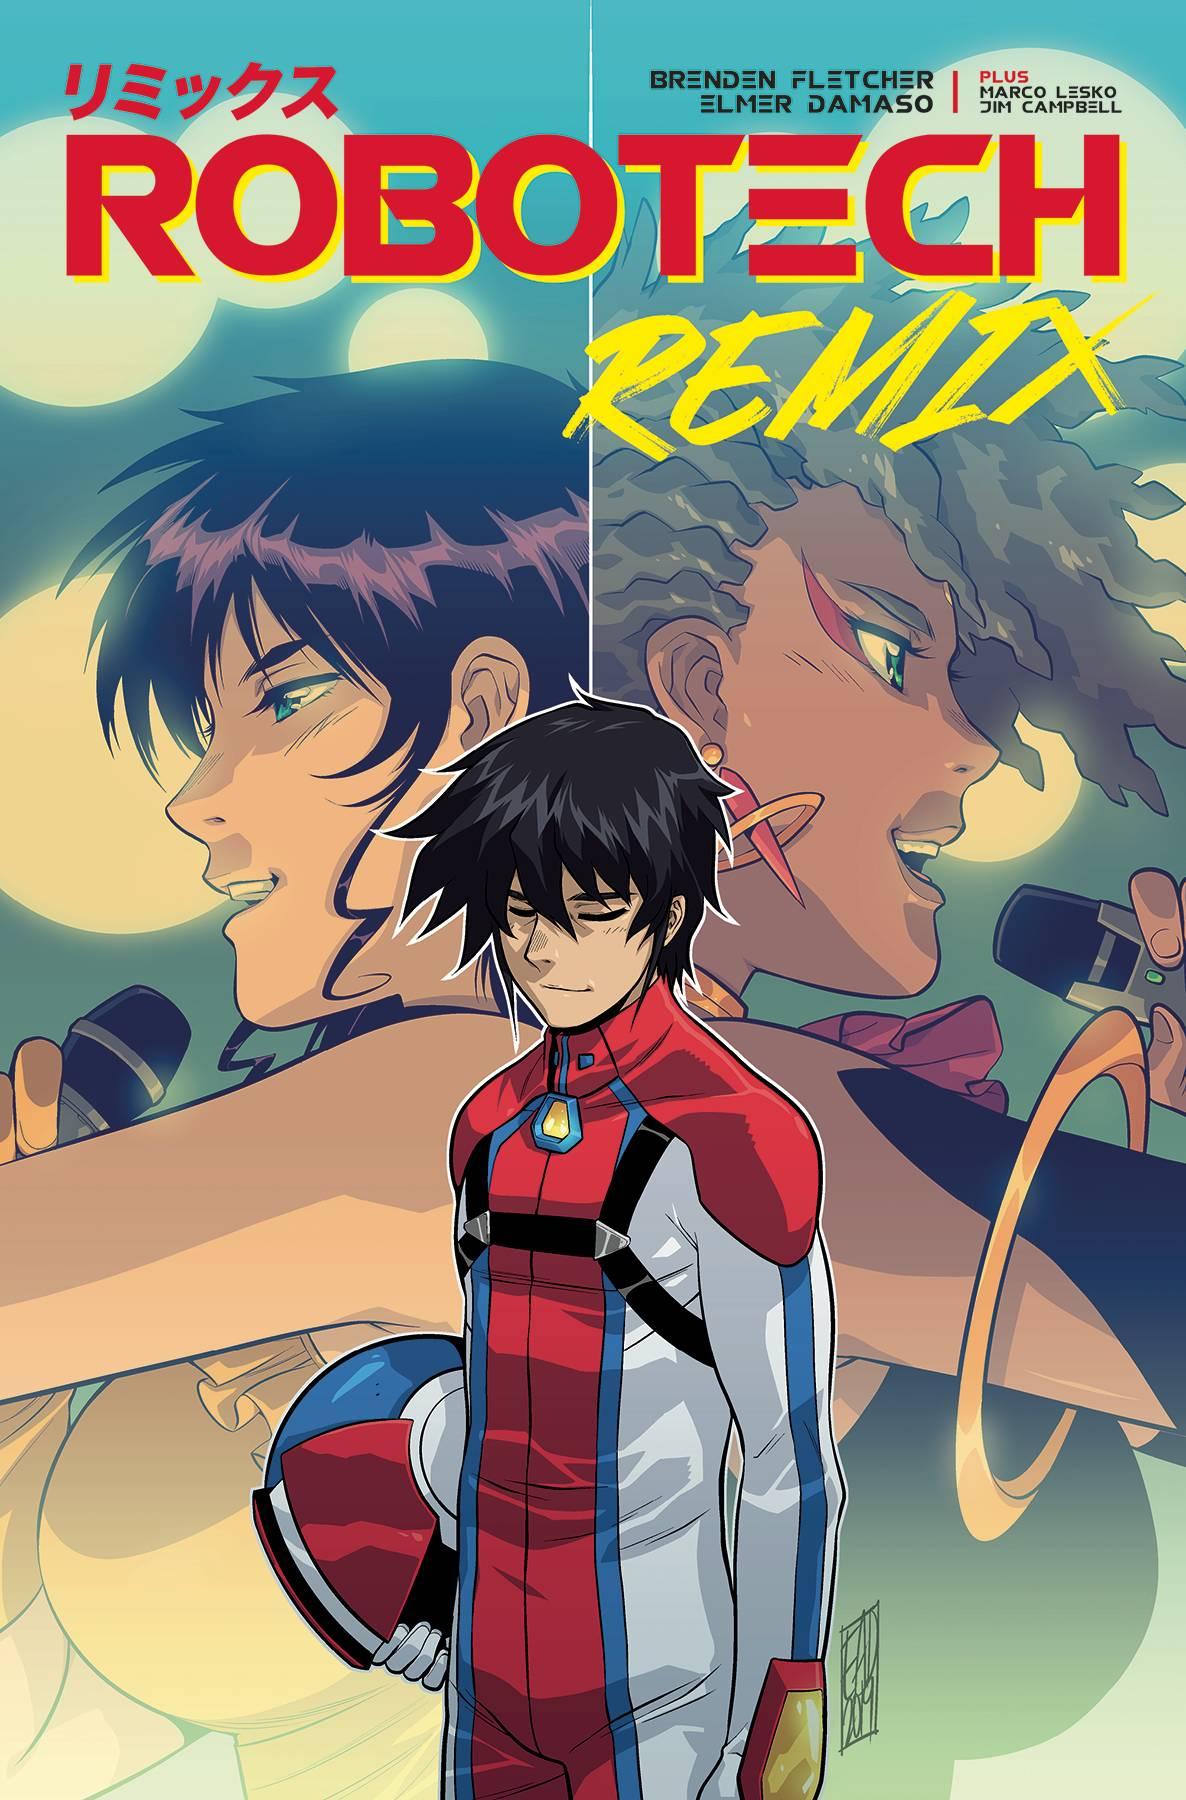 Robotech Remix #4 (2020)